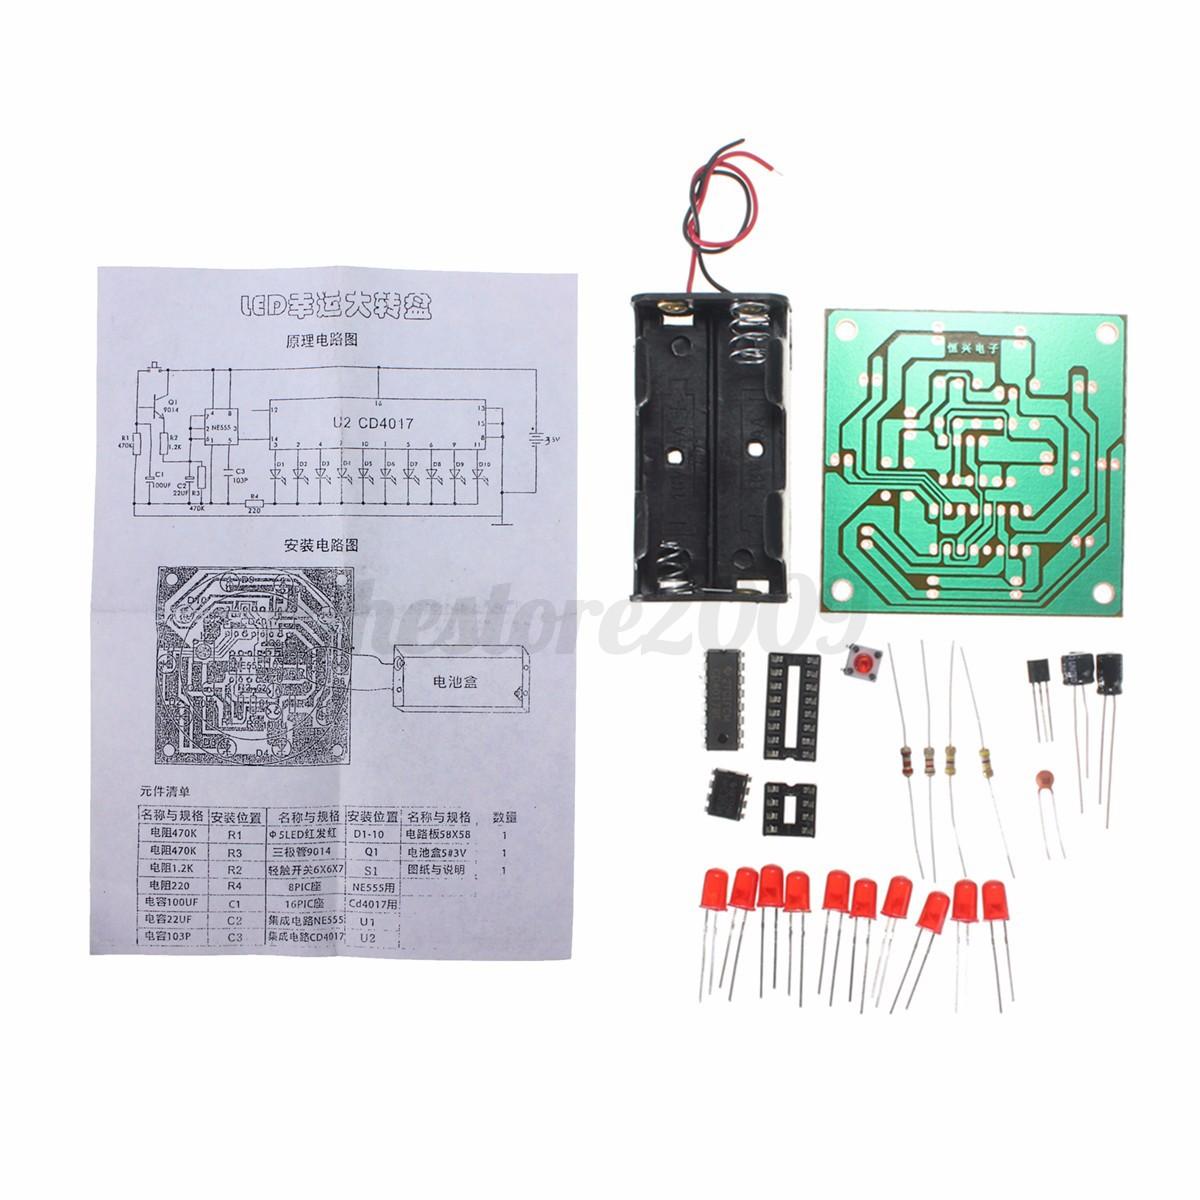 circuit diy kit 10 led flash light kit electronic wheel of fortune rh ebay com